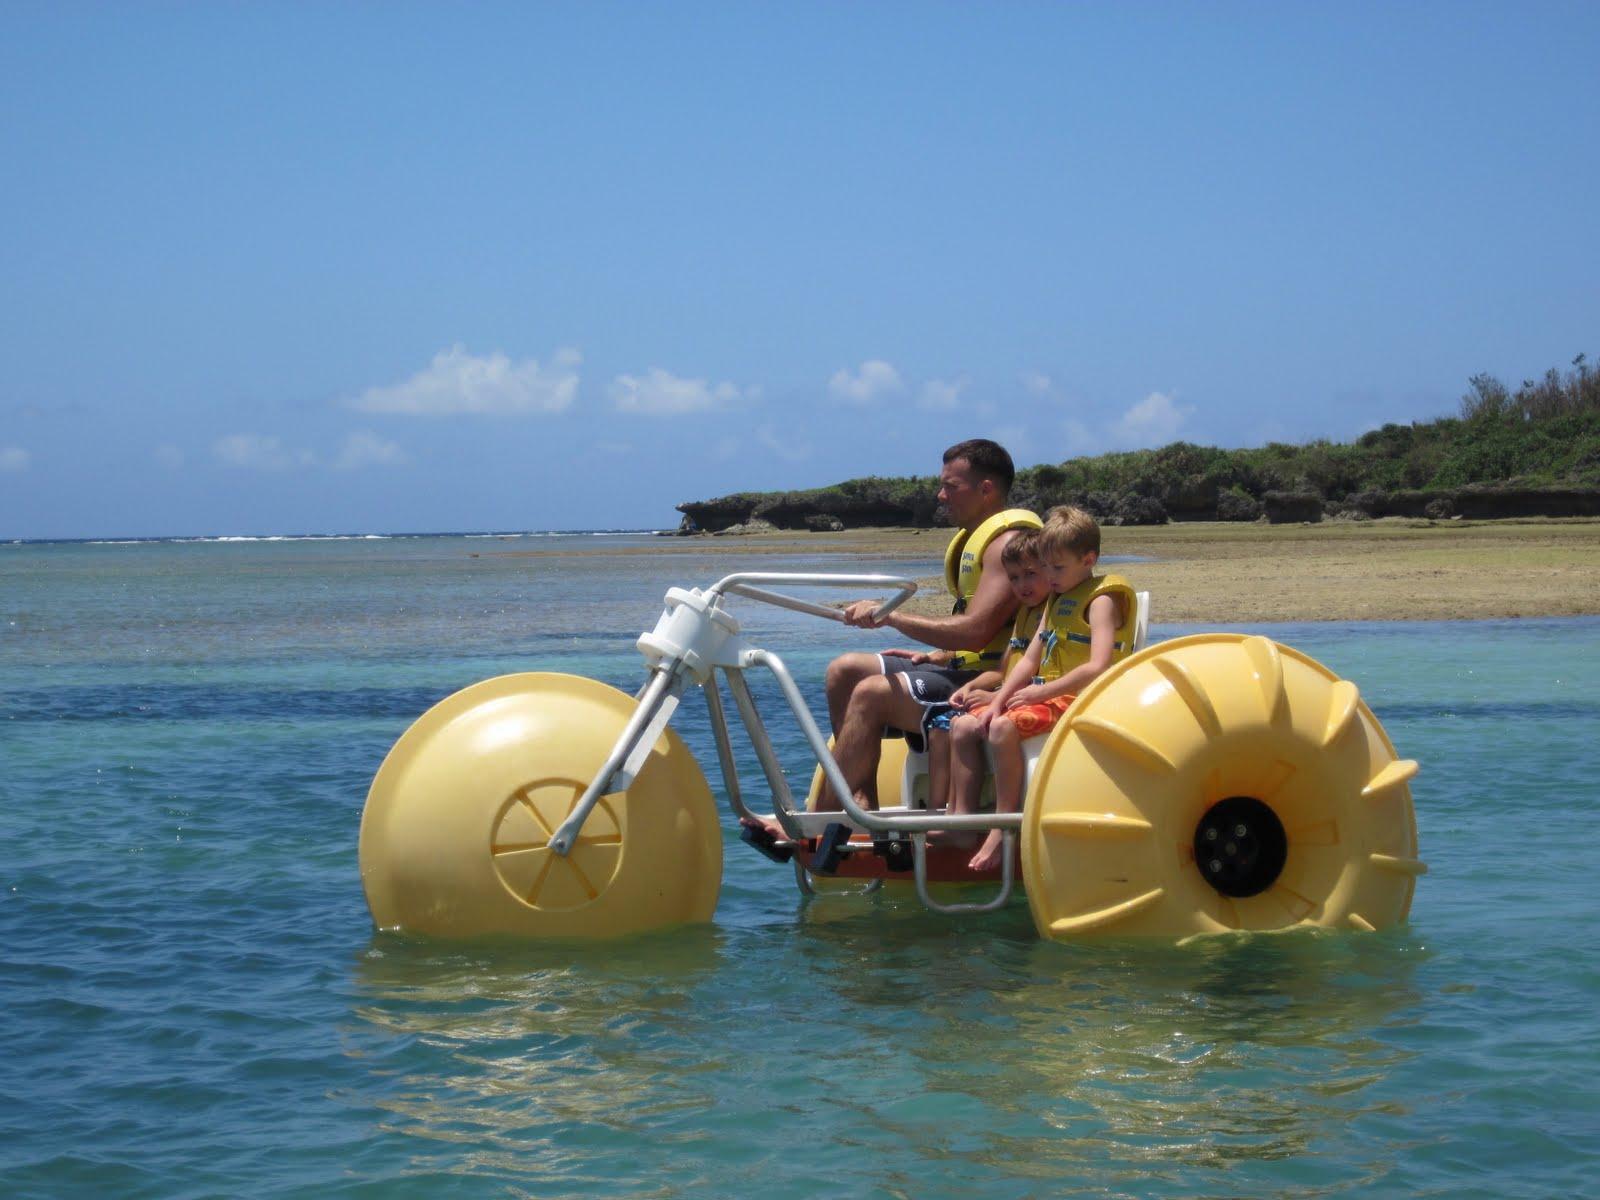 Water Bike Rentals MWRHawaii My Dream MWR Hawaii Event